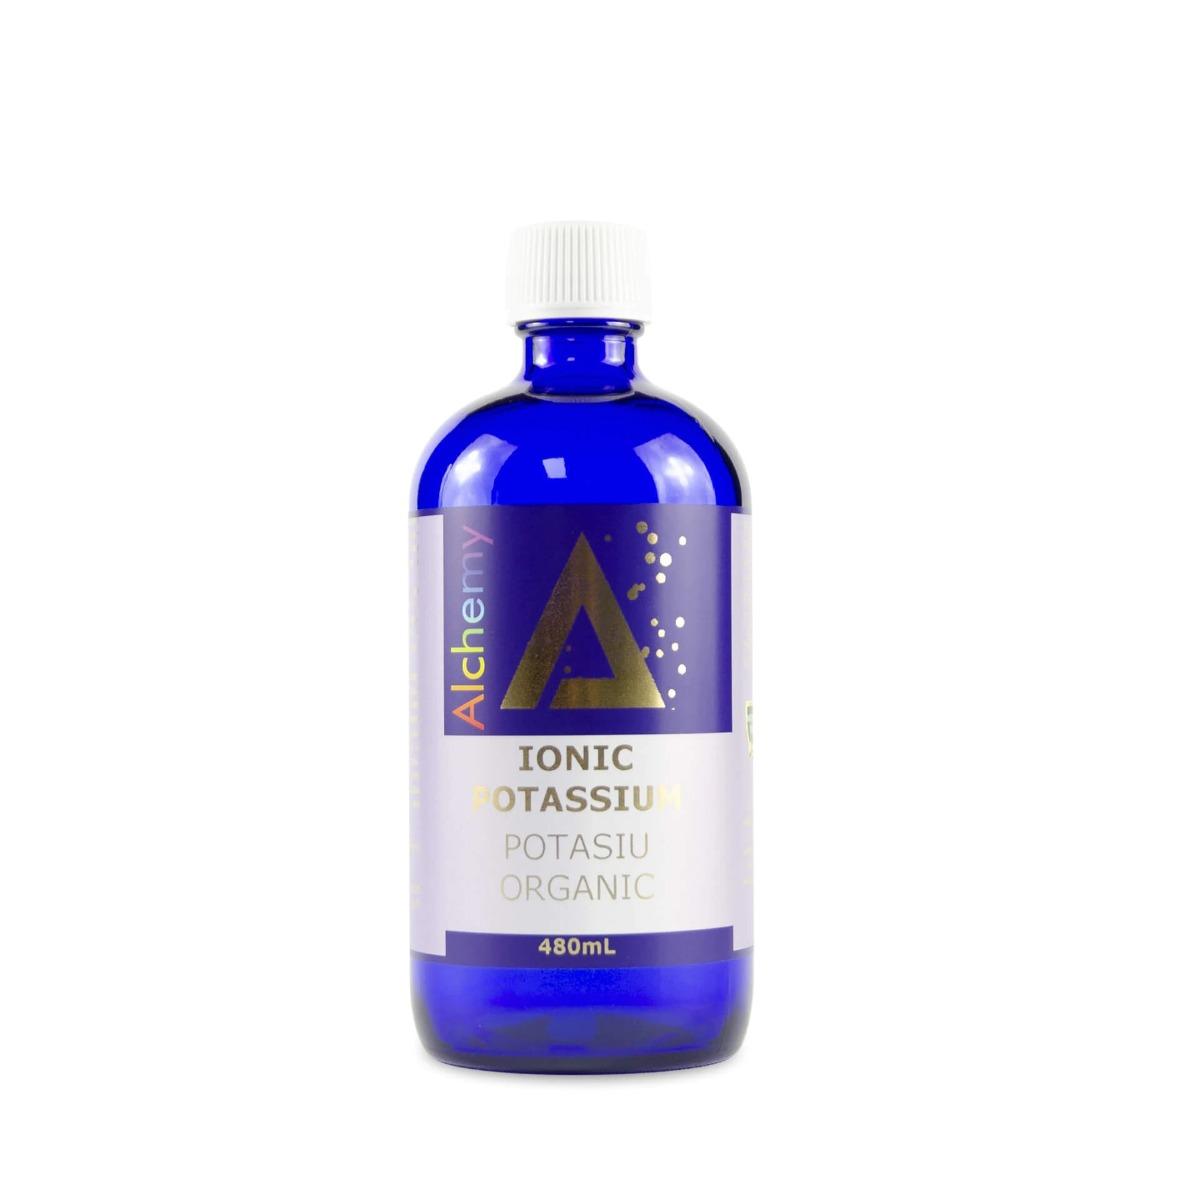 Ionic Potassium potasiu ionic organic Alchemy, 480ml, Aghoras drmax.ro